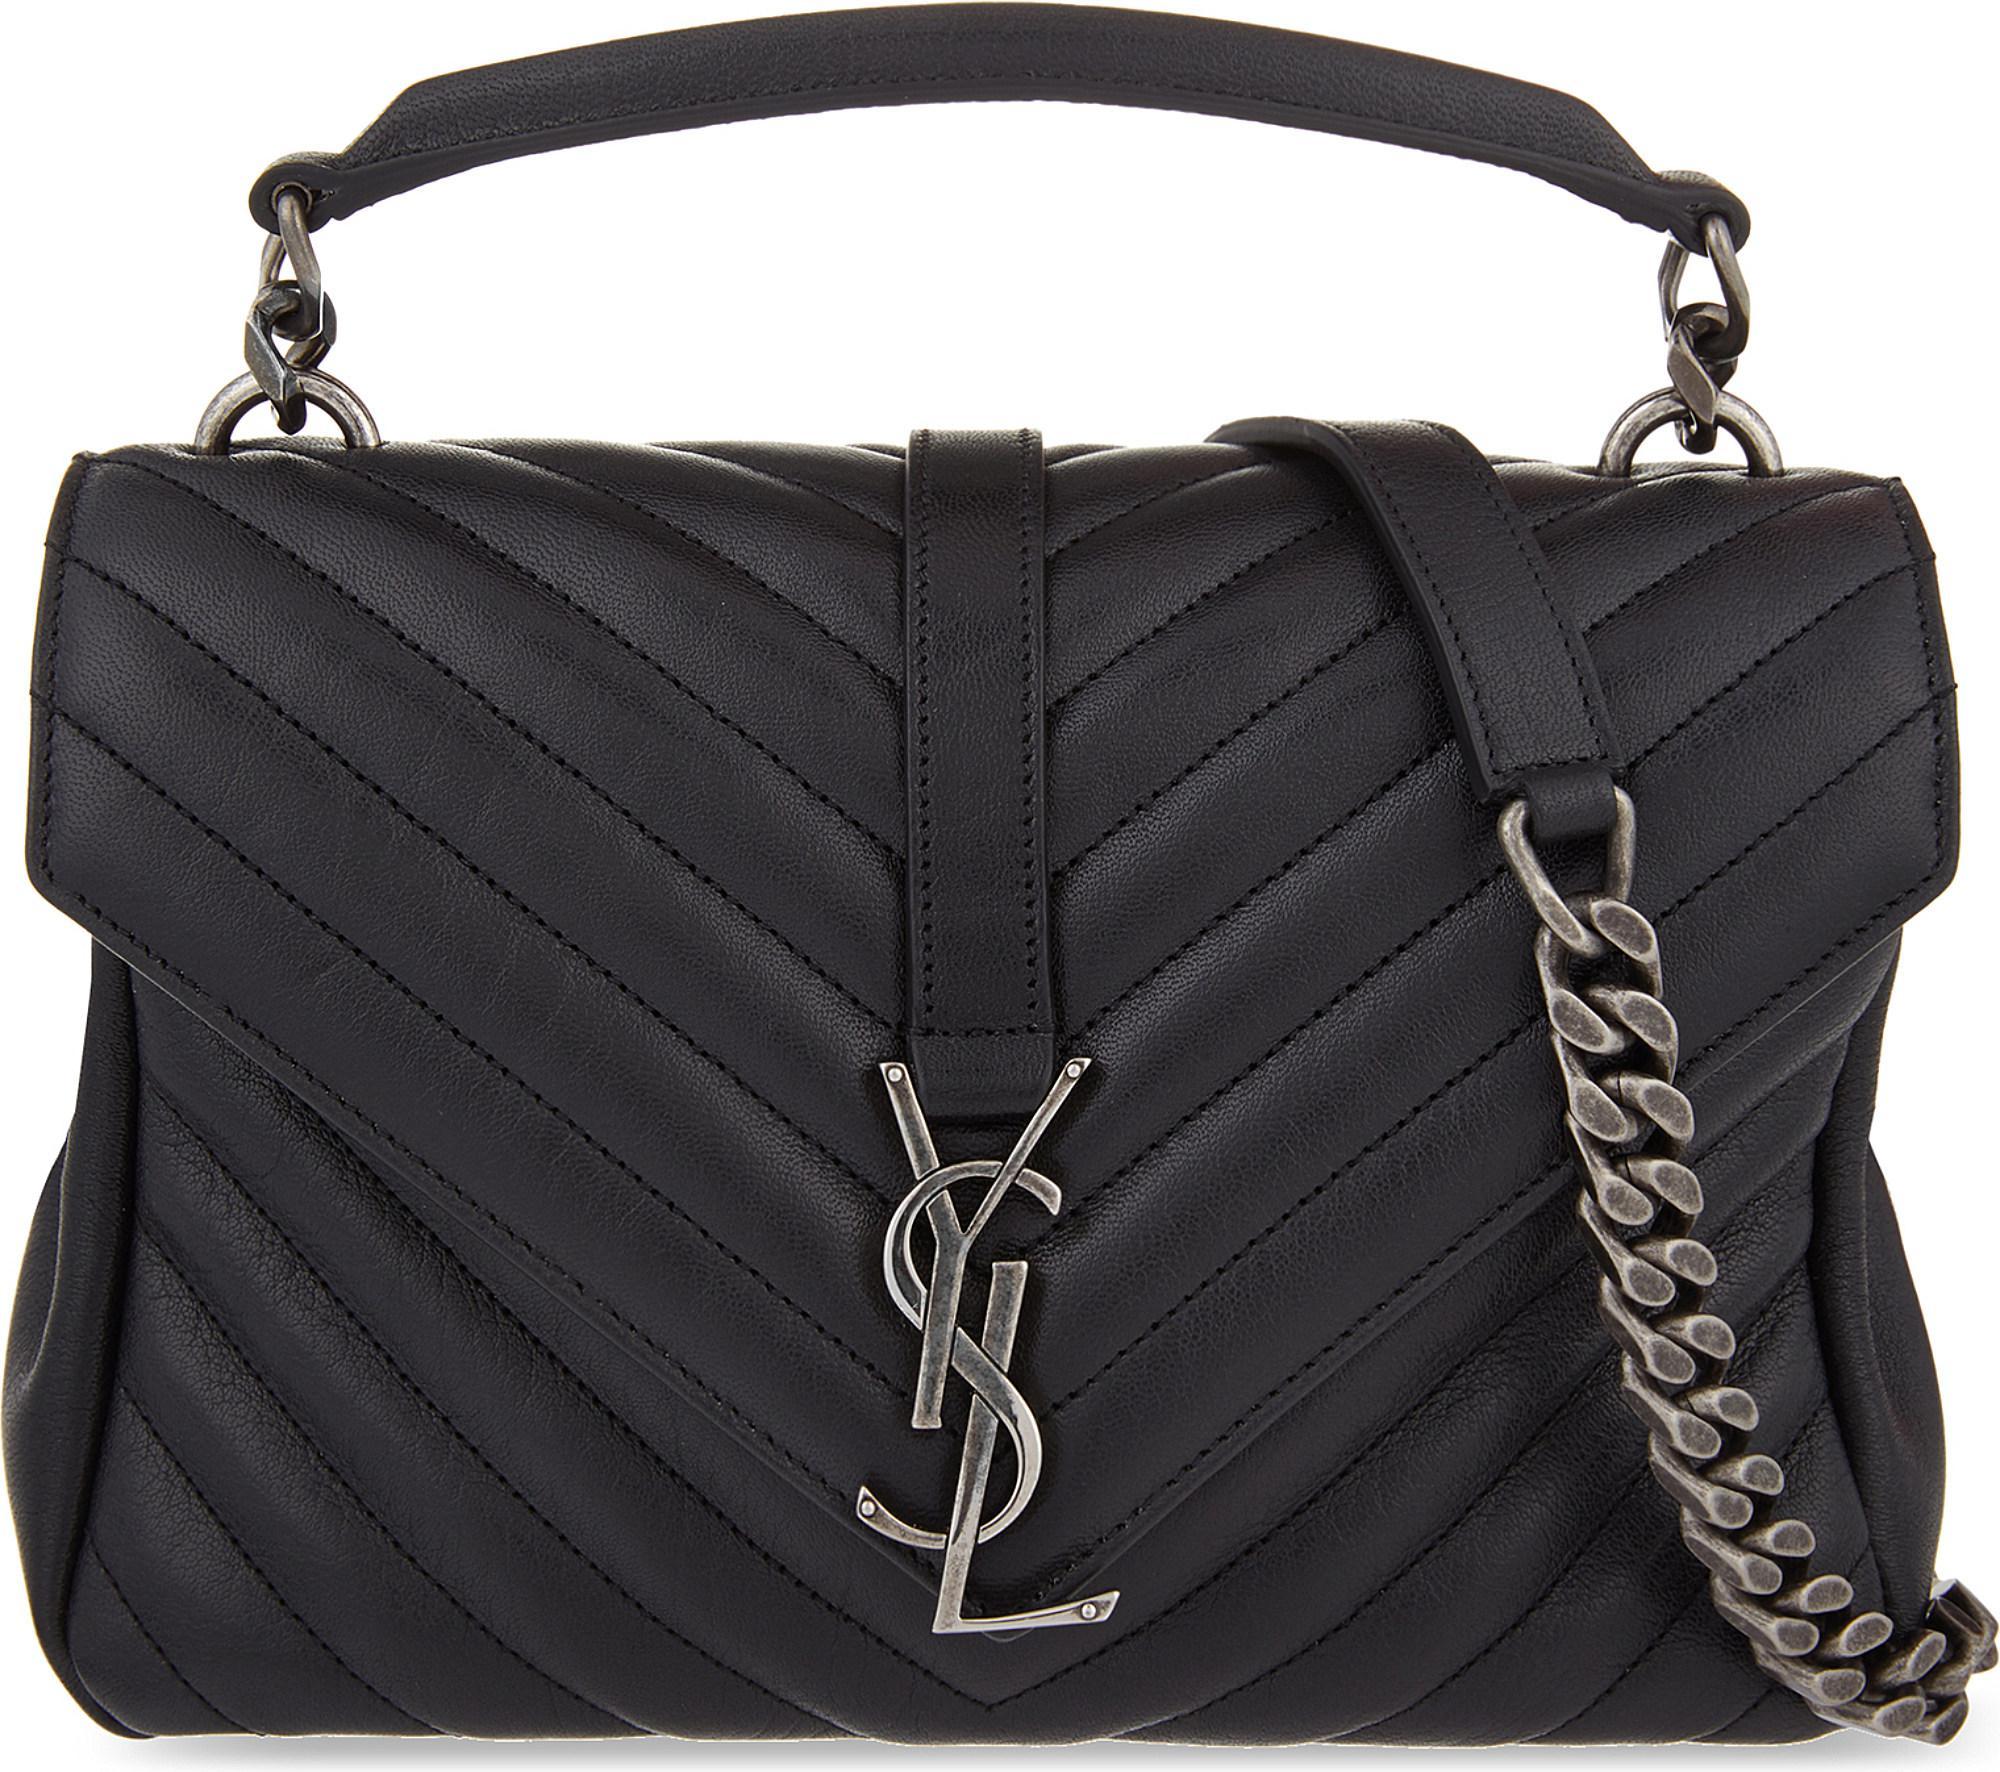 Saint Laurent. Women s Black Monogram College Small Quilted Leather Shoulder  Bag ebce69dedb